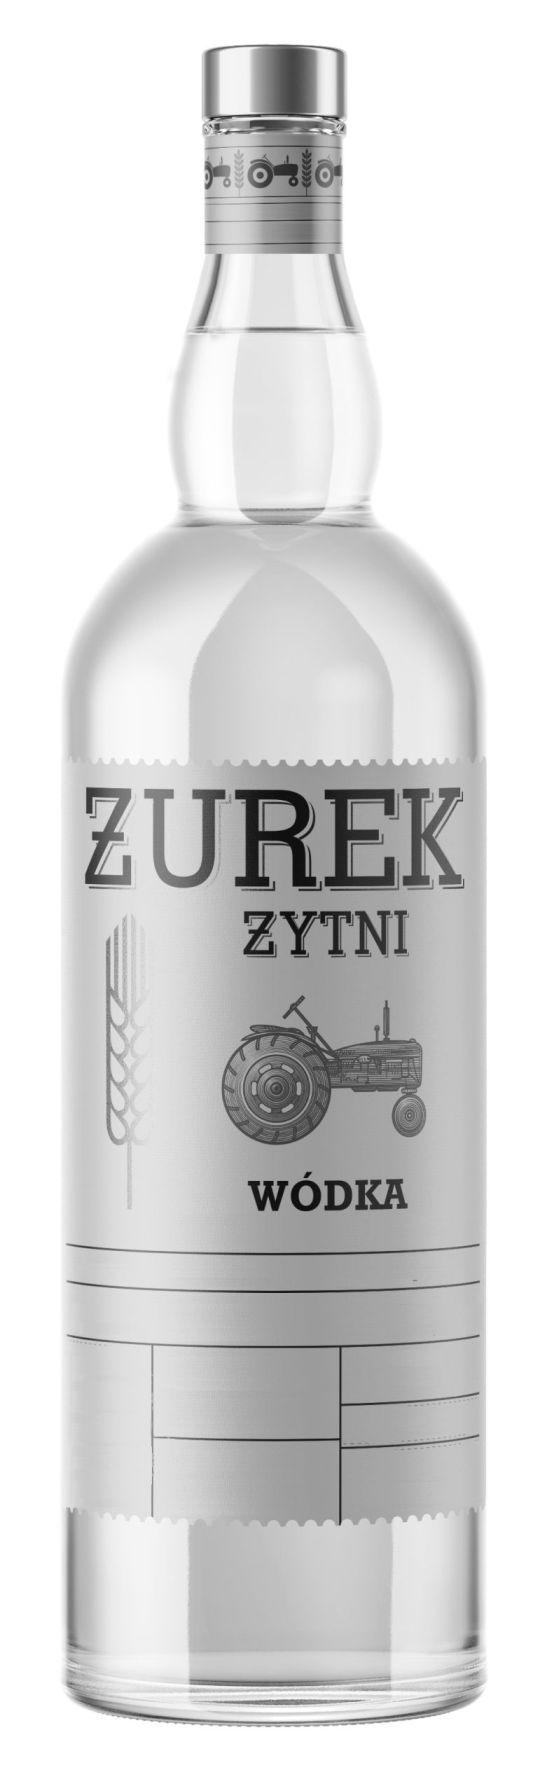 Bildmarke: Żurek Żytni Wódka